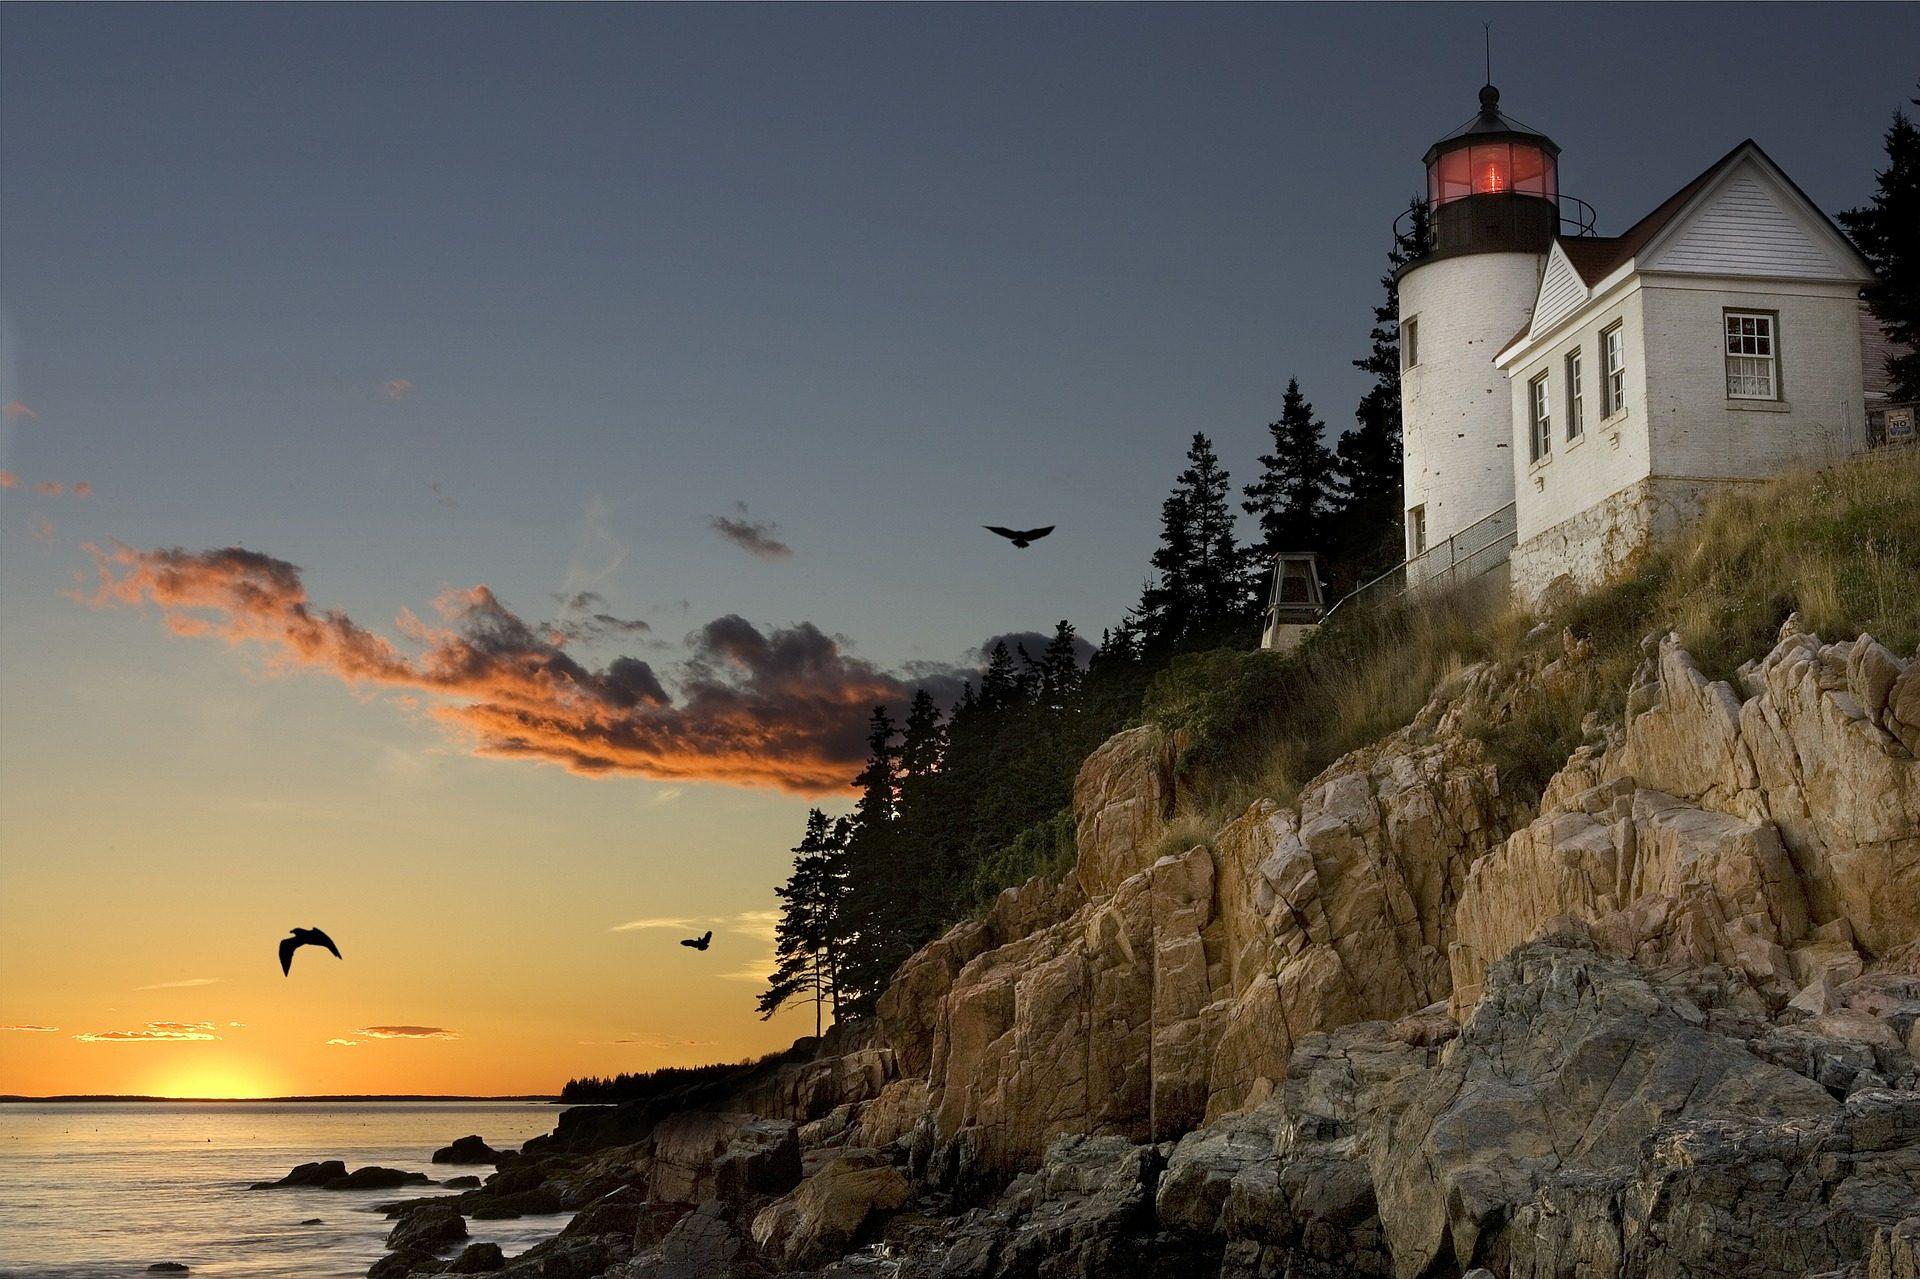 Bar Harbor in Maine, USA